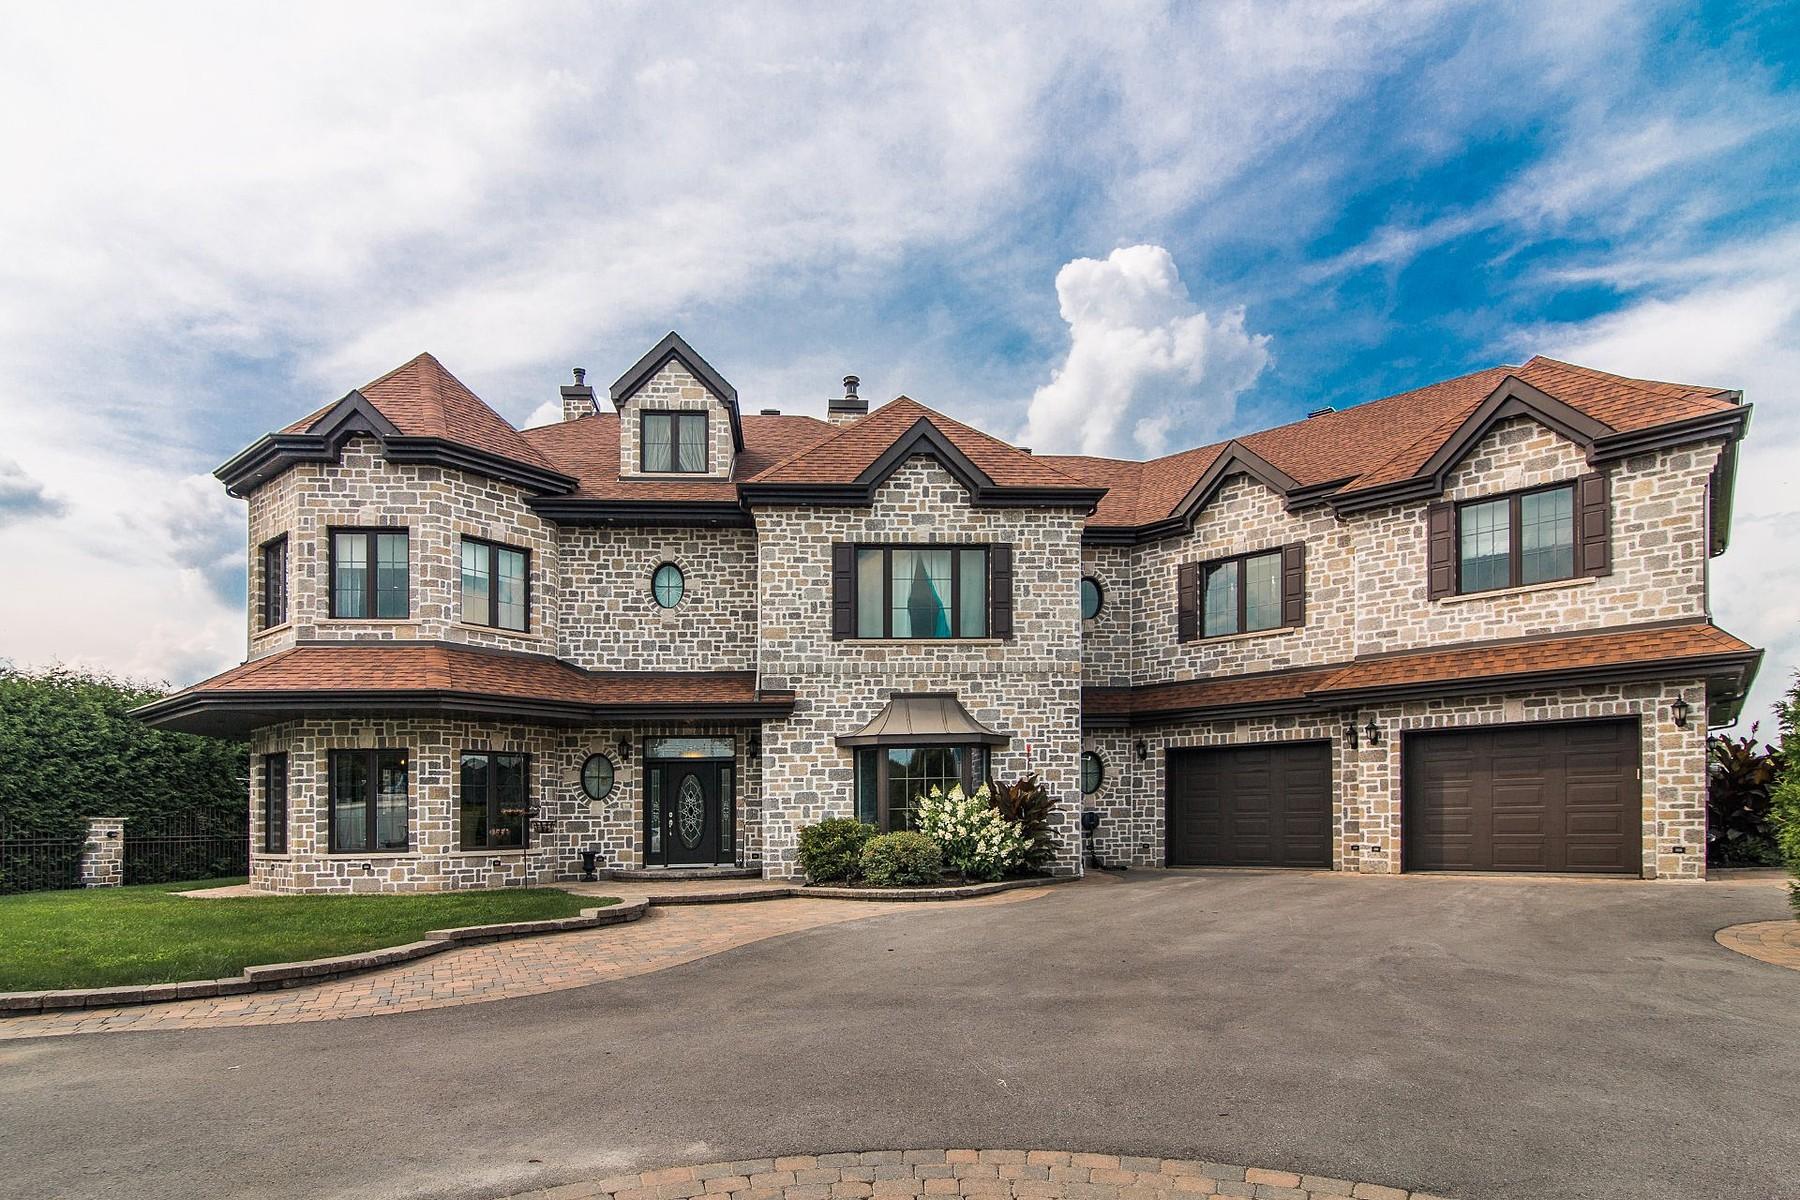 Частный односемейный дом для того Продажа на Terrebonne (Terrebonne), Lanaudière 2335 Côte de Terrebonne Terrebonne, Квебек J6Y1H6 Канада